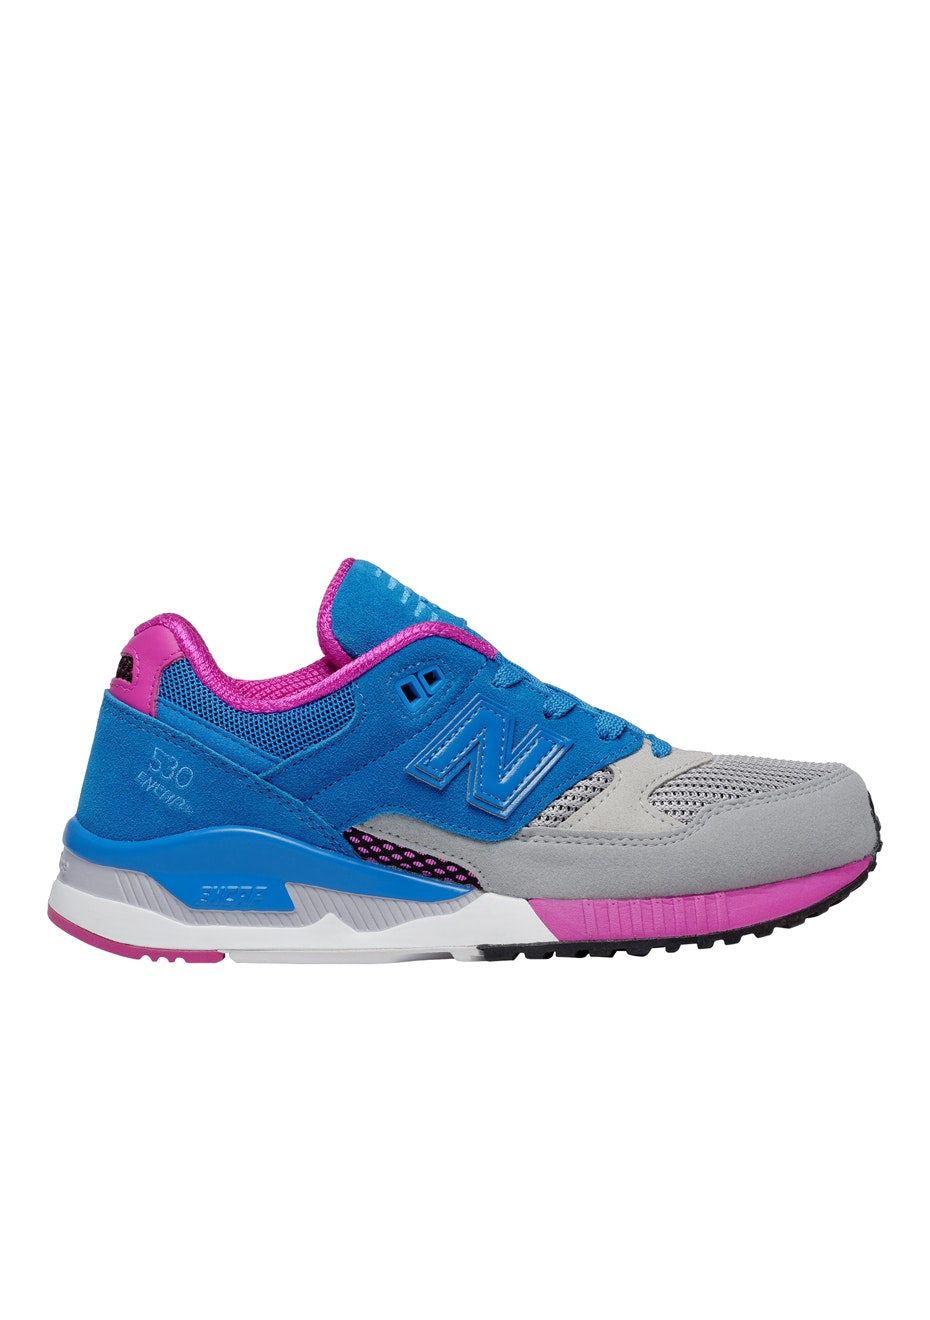 New Balance - Womens - 530 90'S Running - Blue / Grey / Pink